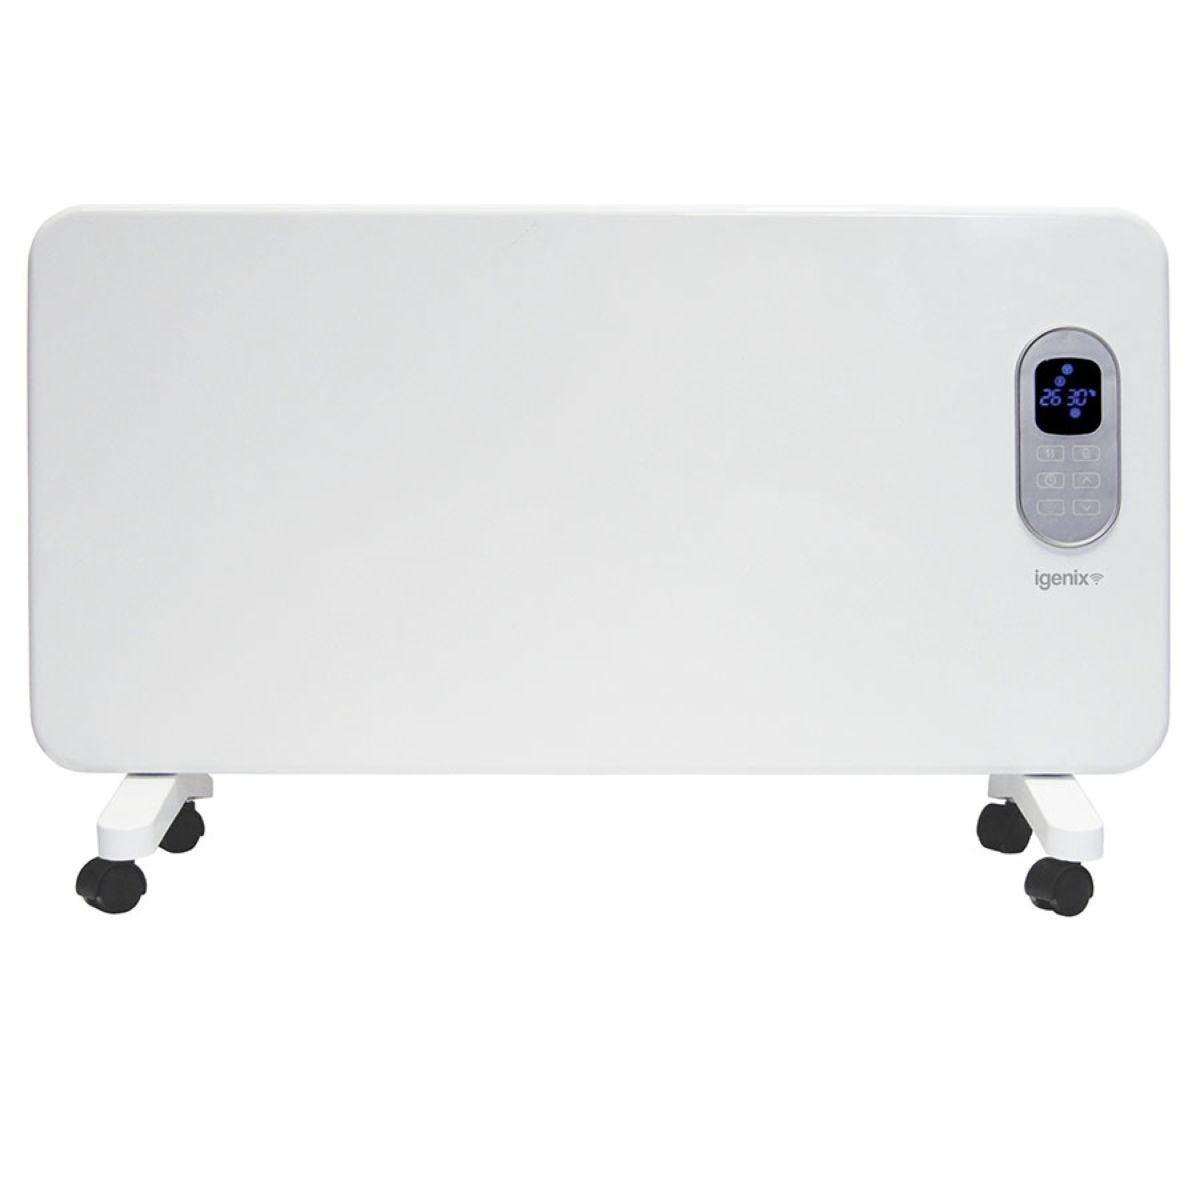 Igenix 2000W Wi-Fi Enabled Panel Heater - White